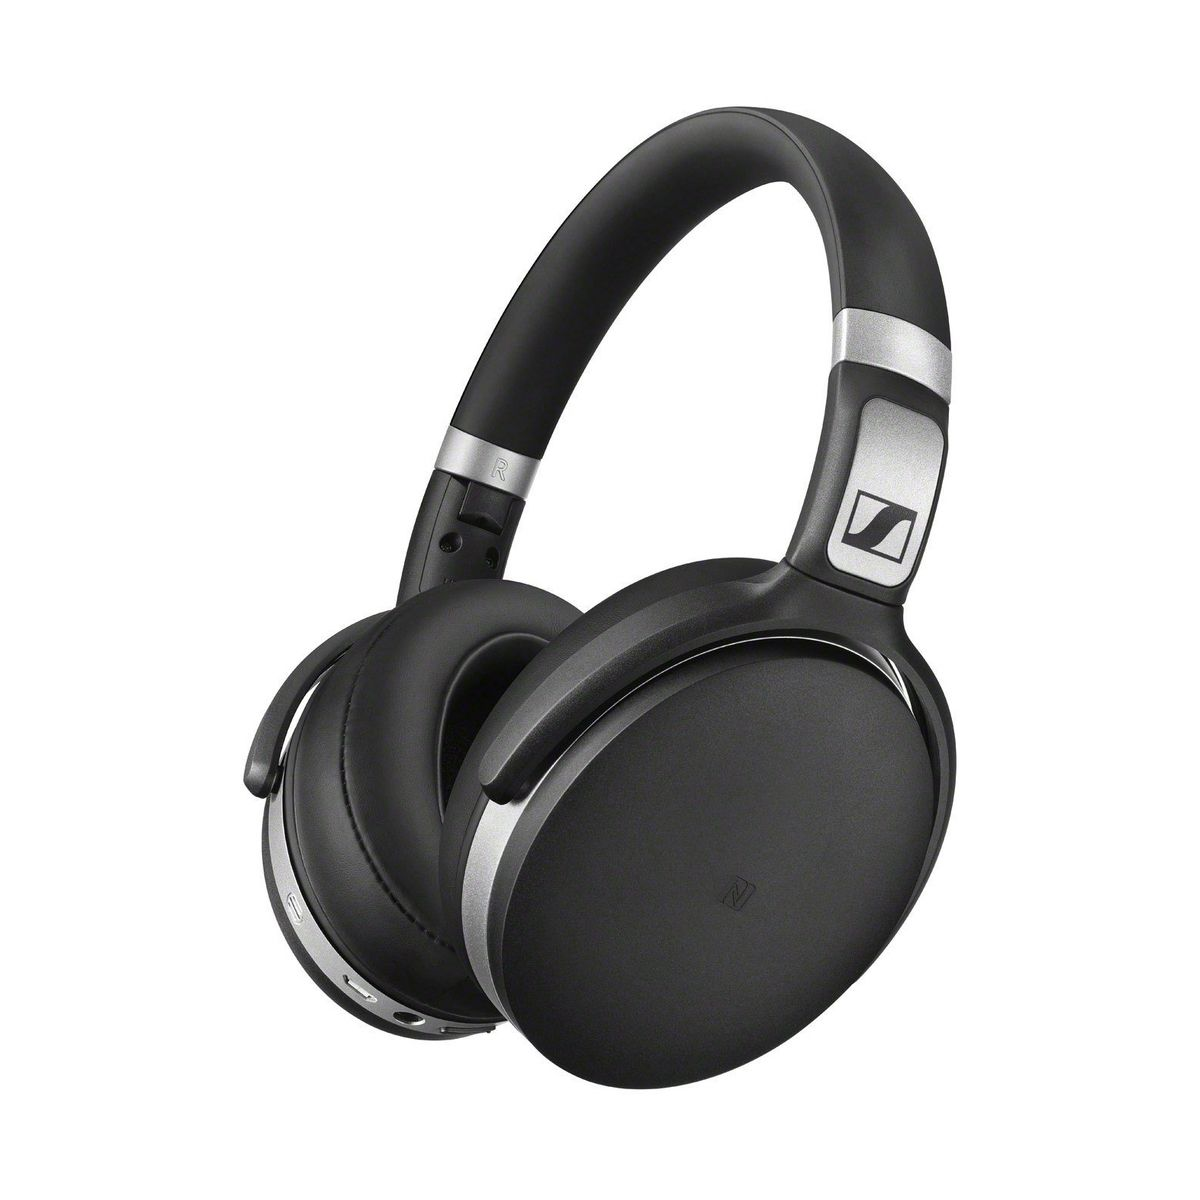 Casque audio sans fil HD 4.50 BTNC Wireless - Noir